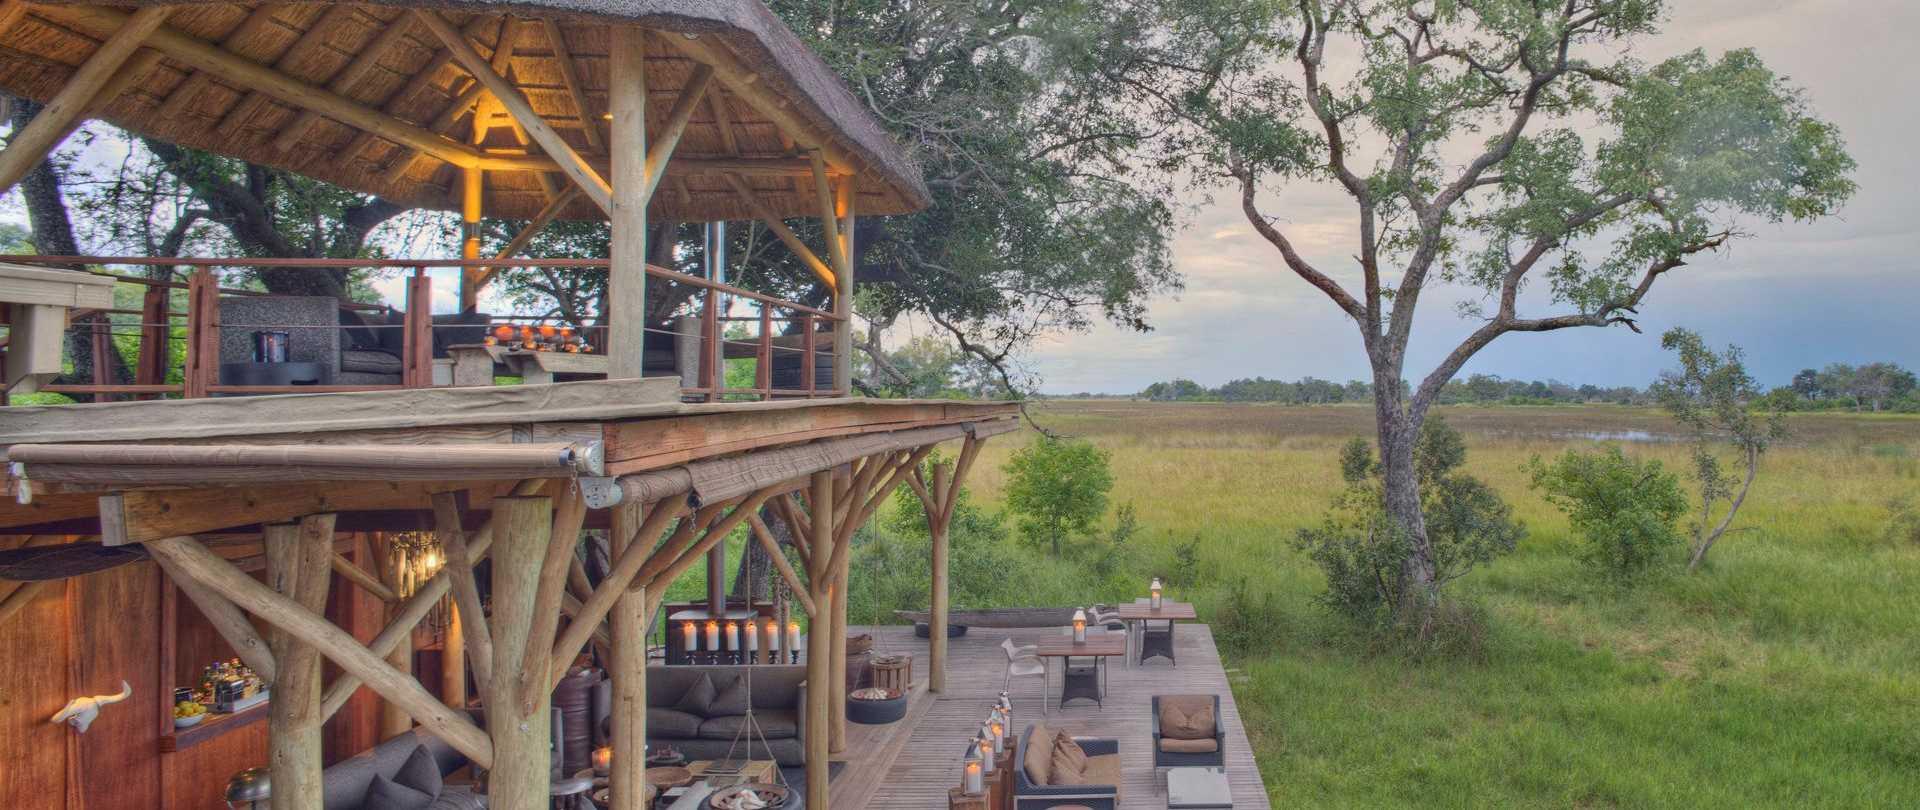 a-botswana-safari-at-andbeyond-xudum-okavango-delta-lodge-42.jpg.1920x810_default